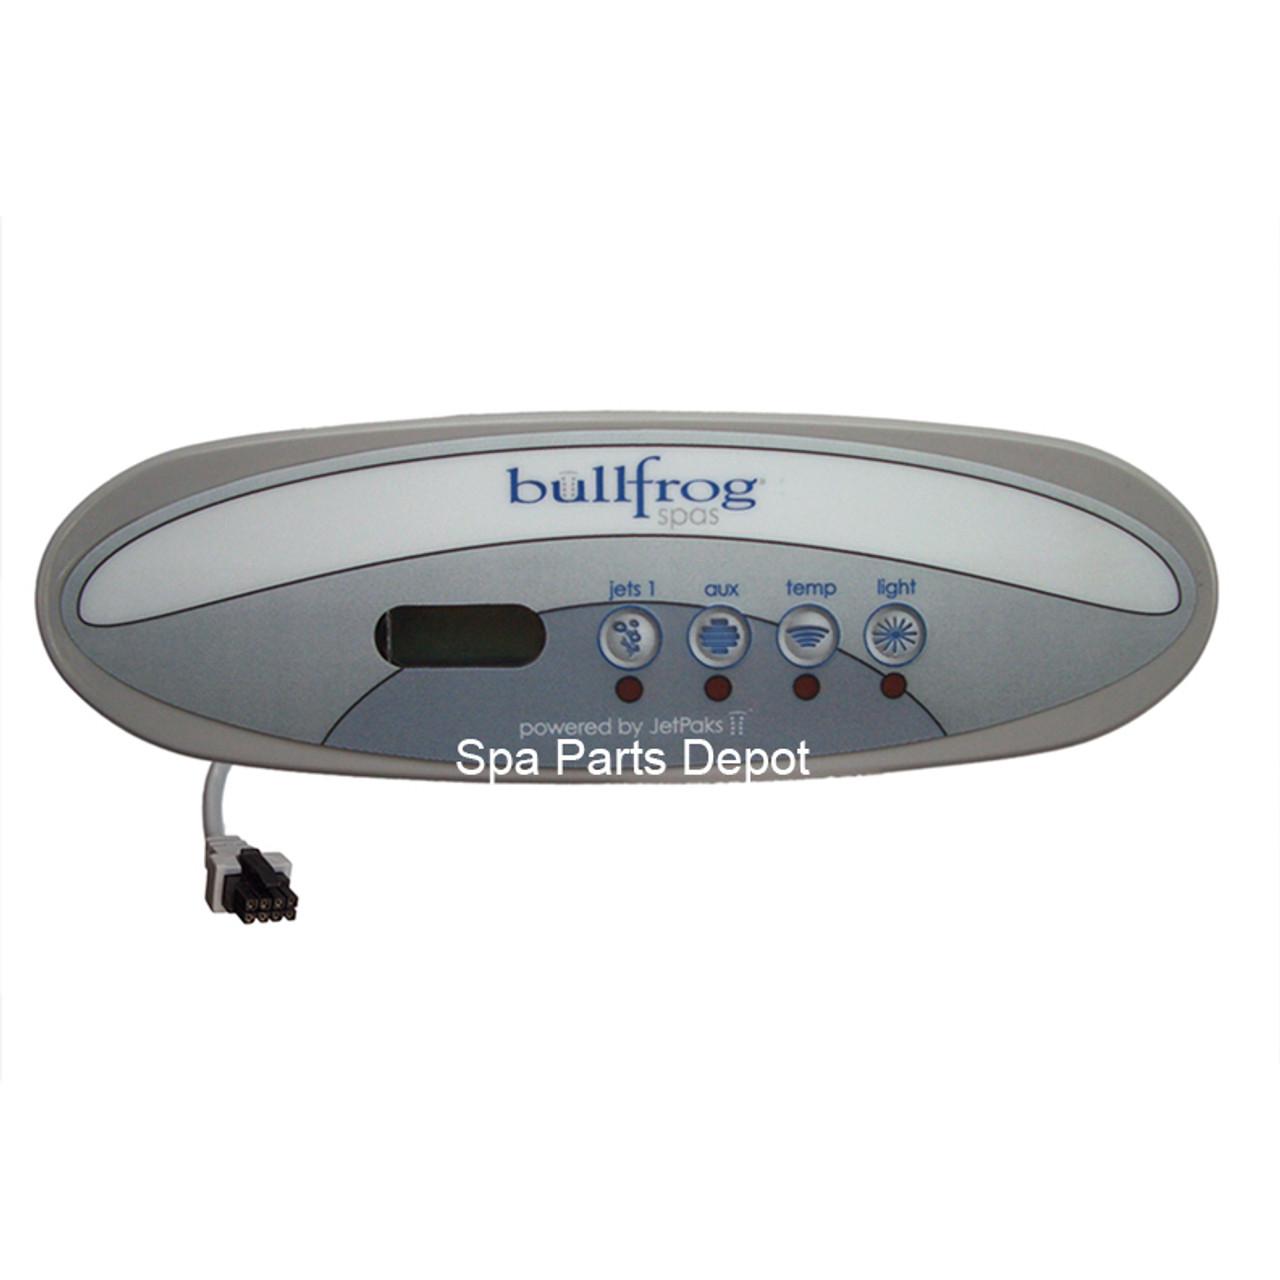 bullfrog spa control panel tadpole 4 button spa parts depot rh spapartsdepot com Imperial Spas by Jacuzzi Manual Jacuzzi J 345 Manuals